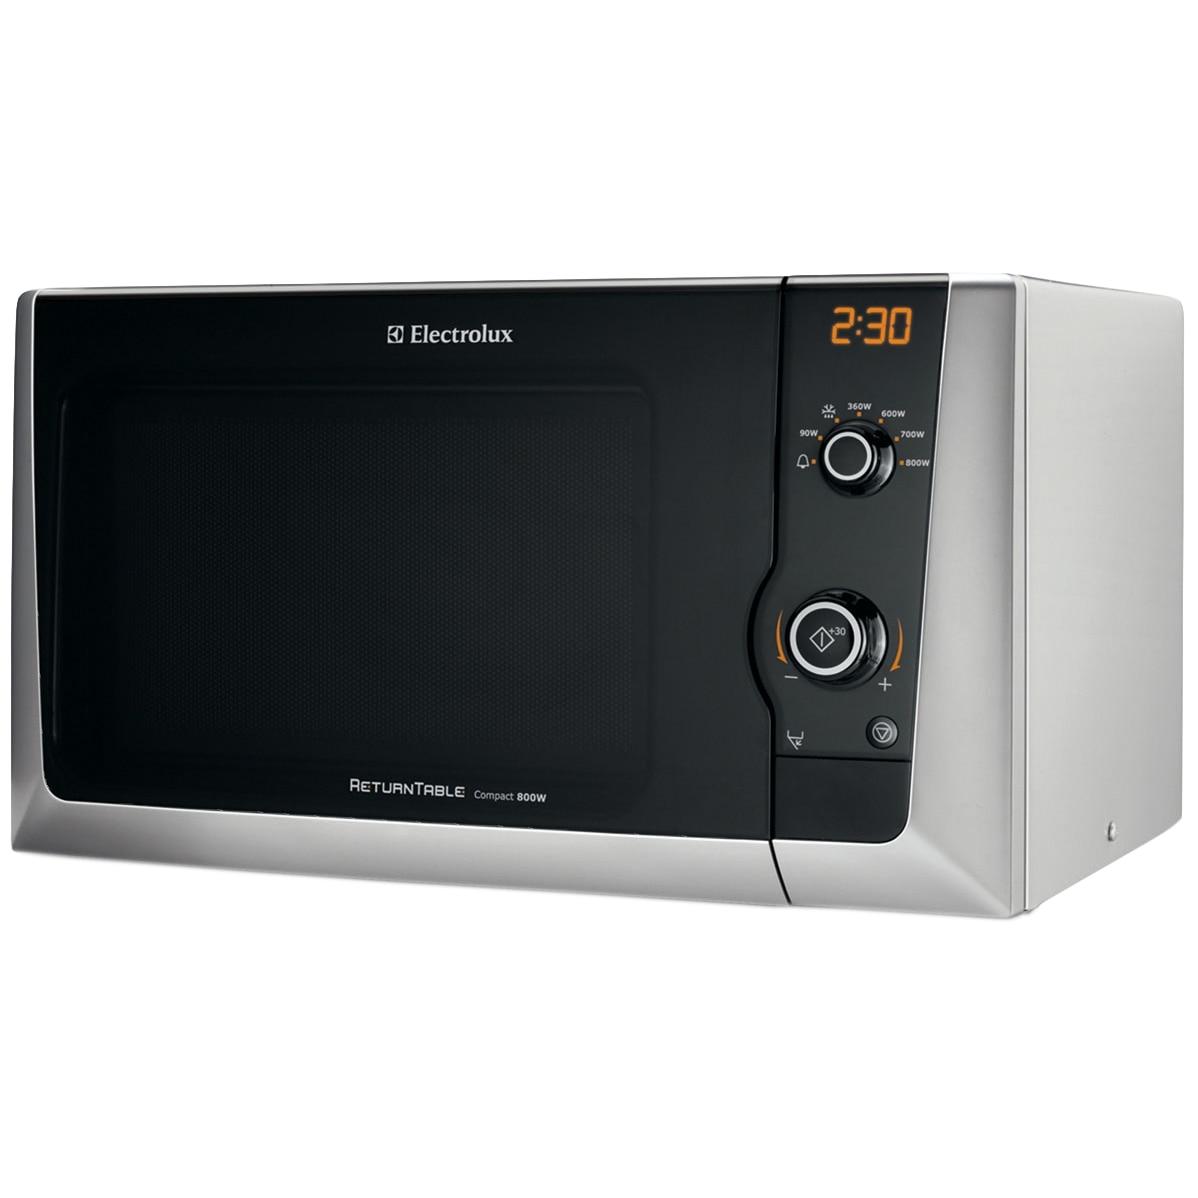 Fotografie Cuptor cu microunde Electrolux EMS21400S, 18 l, 800 W, Grill, Mecanic, Silver